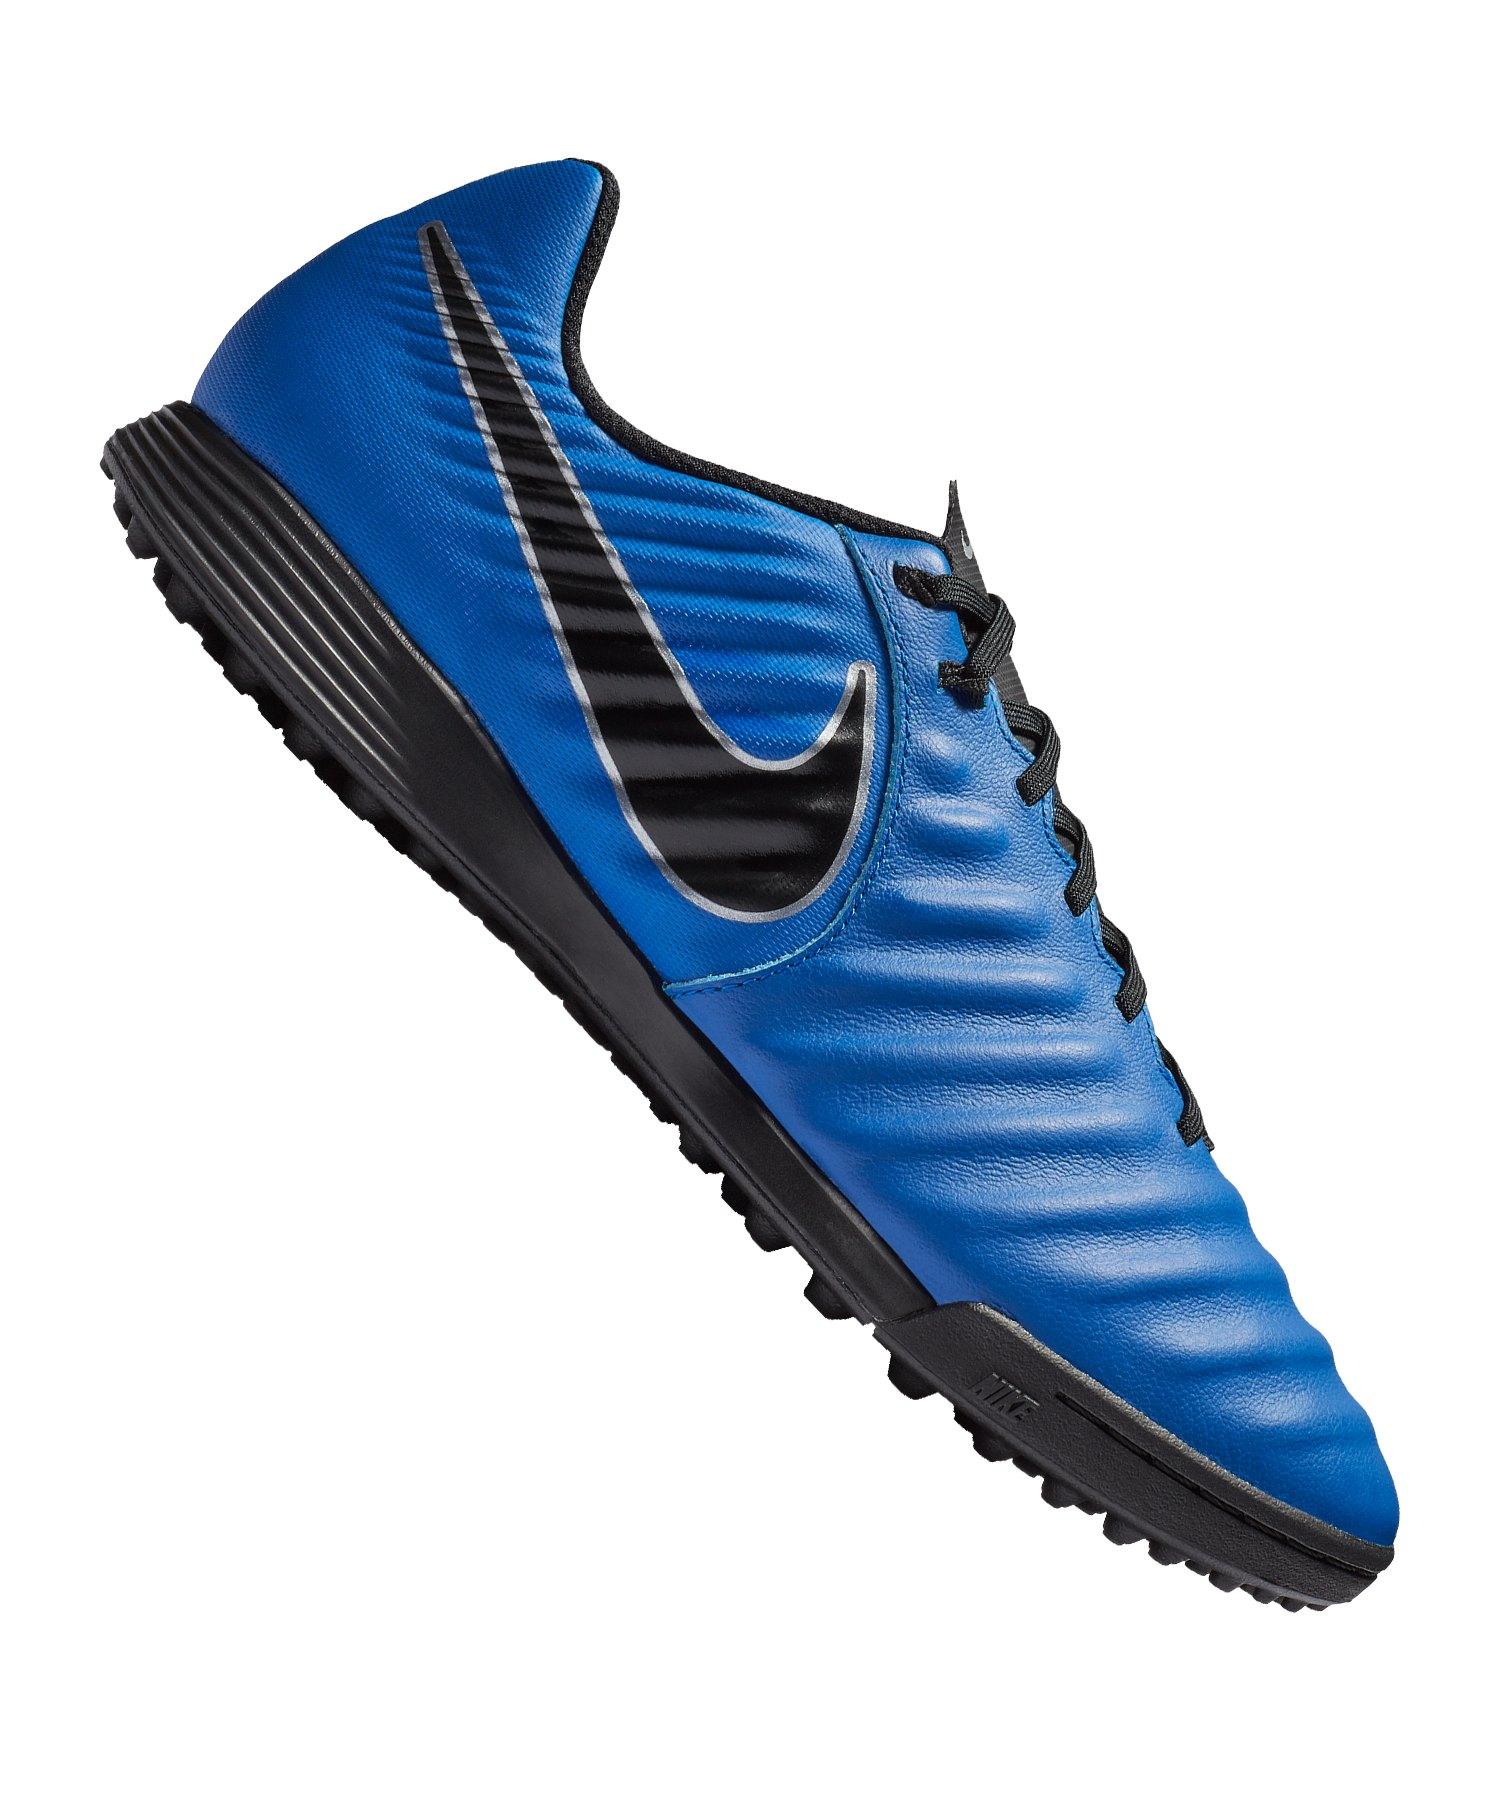 new product 22f81 afd15 Nike Tiempo LegendX VII Academy TF Blau F400